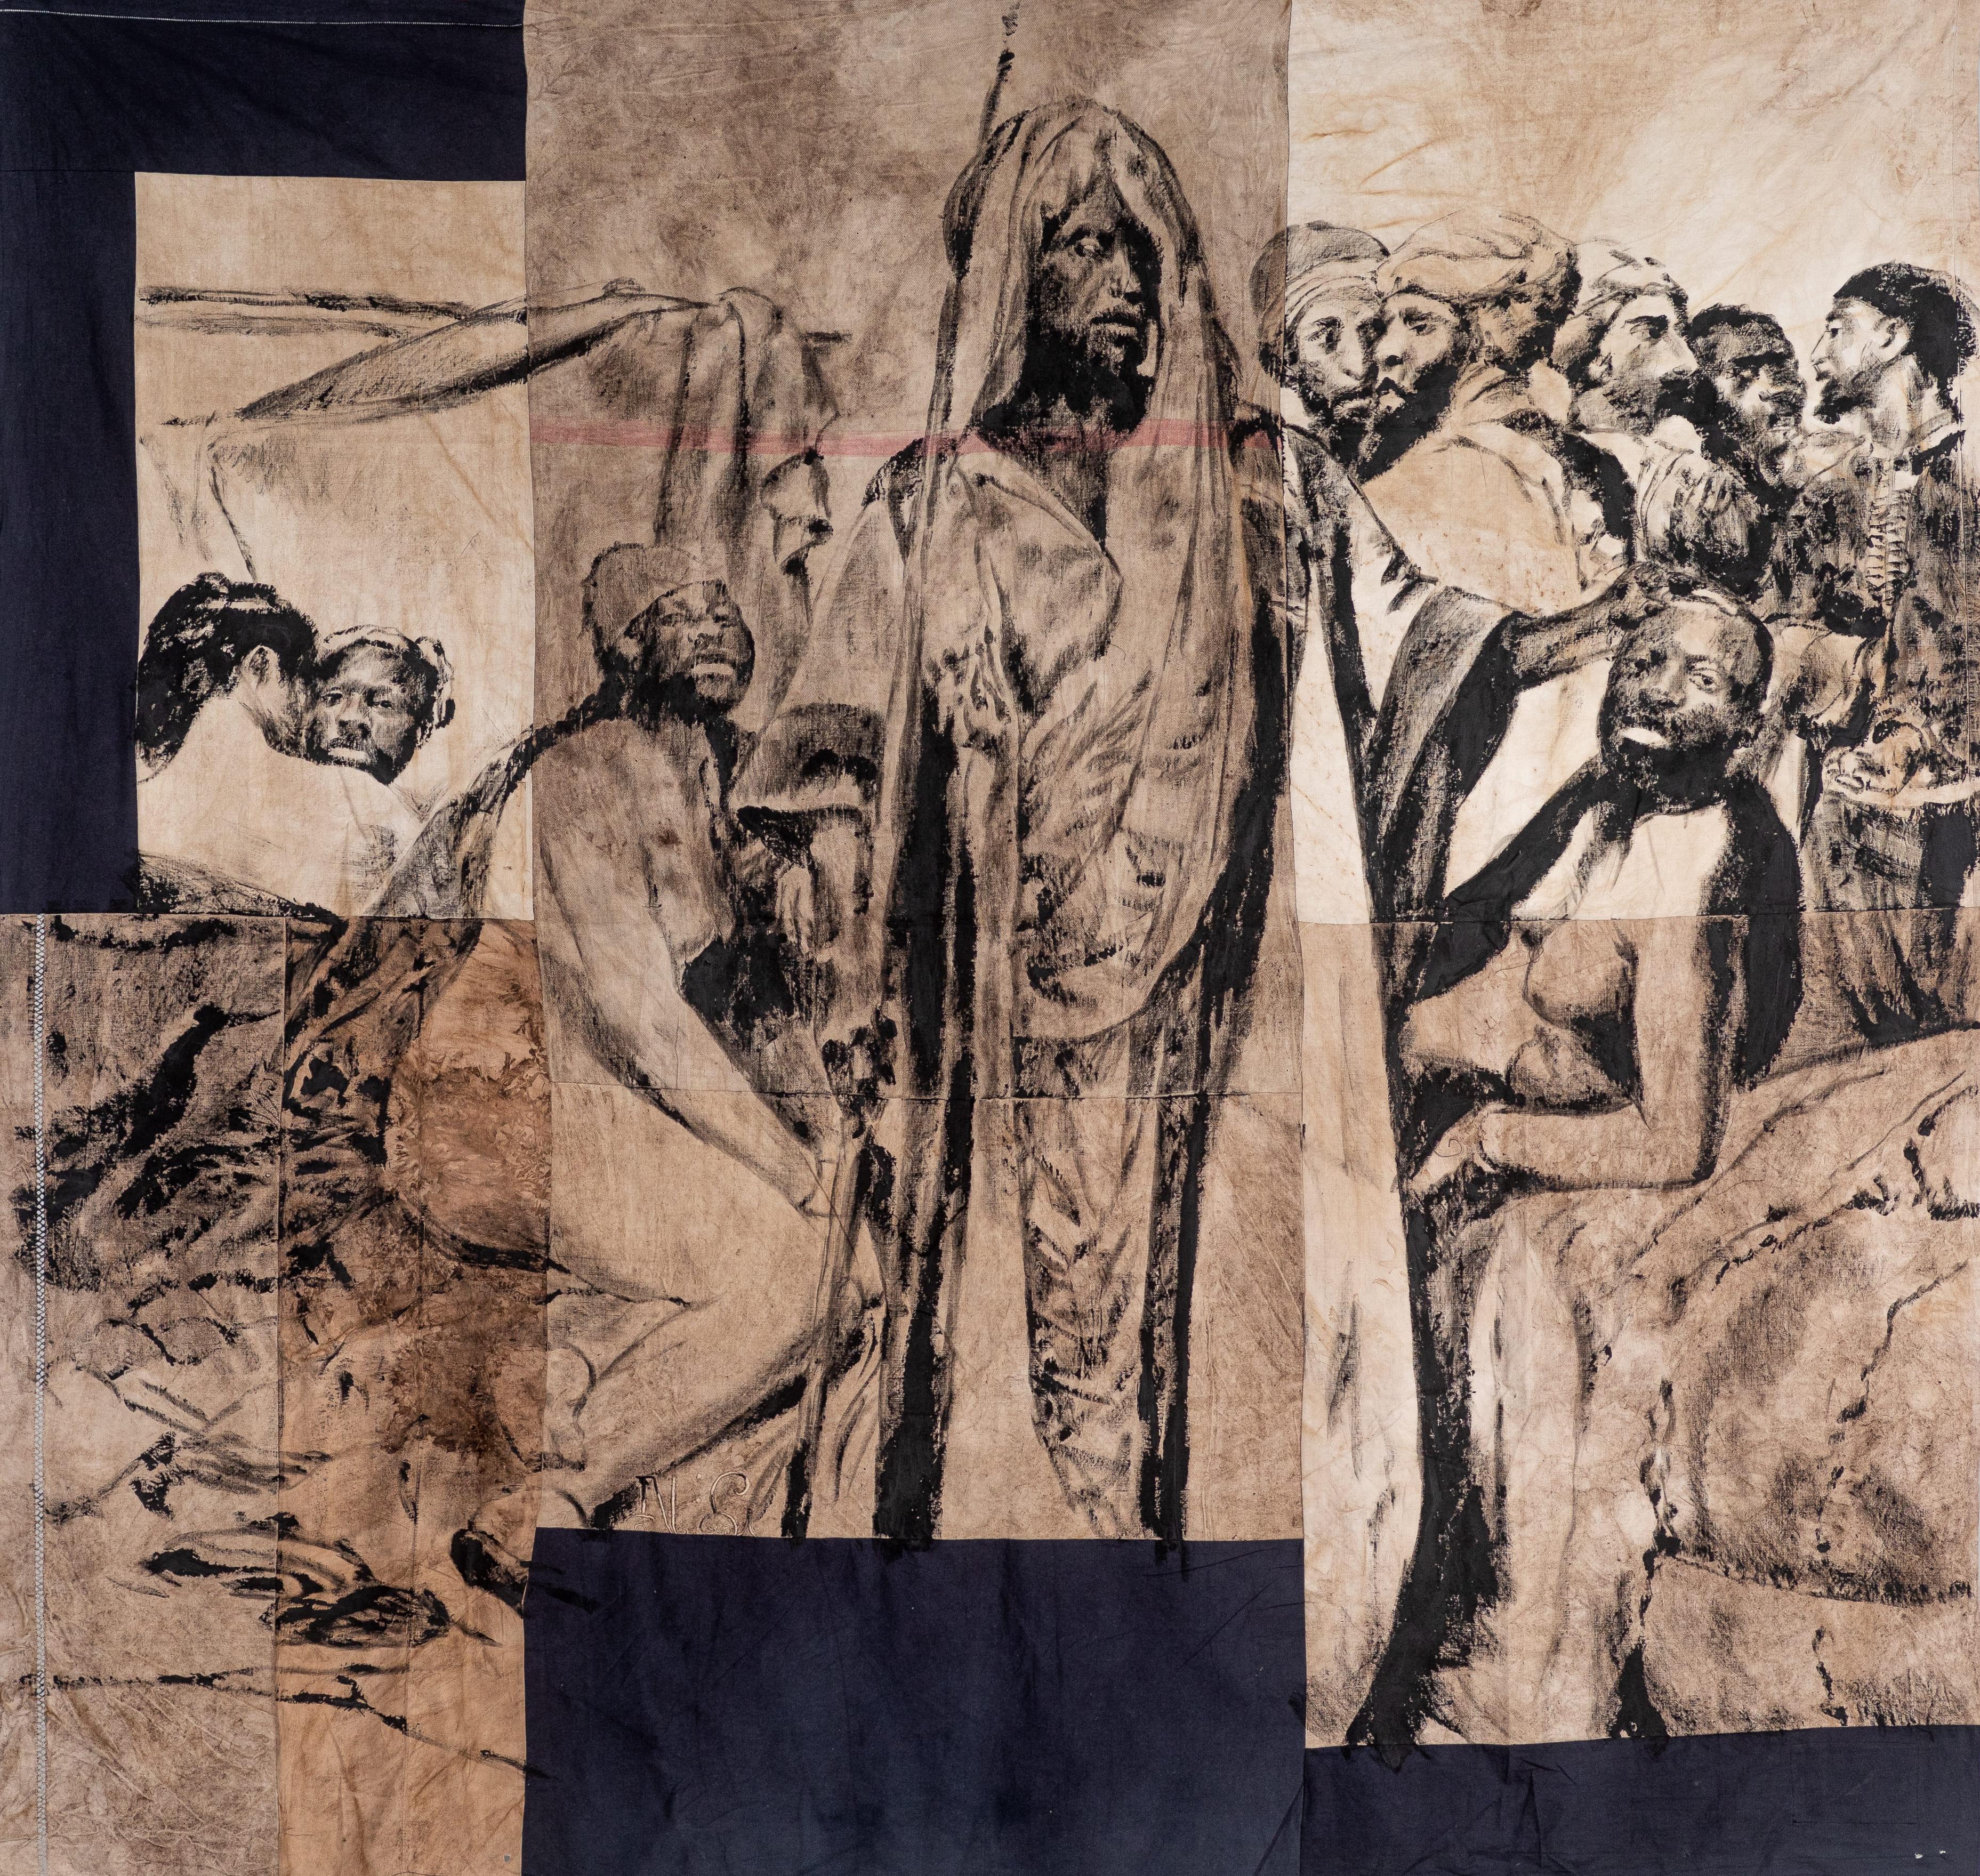 Galerie_Fakhoury - 13-09-2020 - HD - JPG (sRVB) (8 of 31)